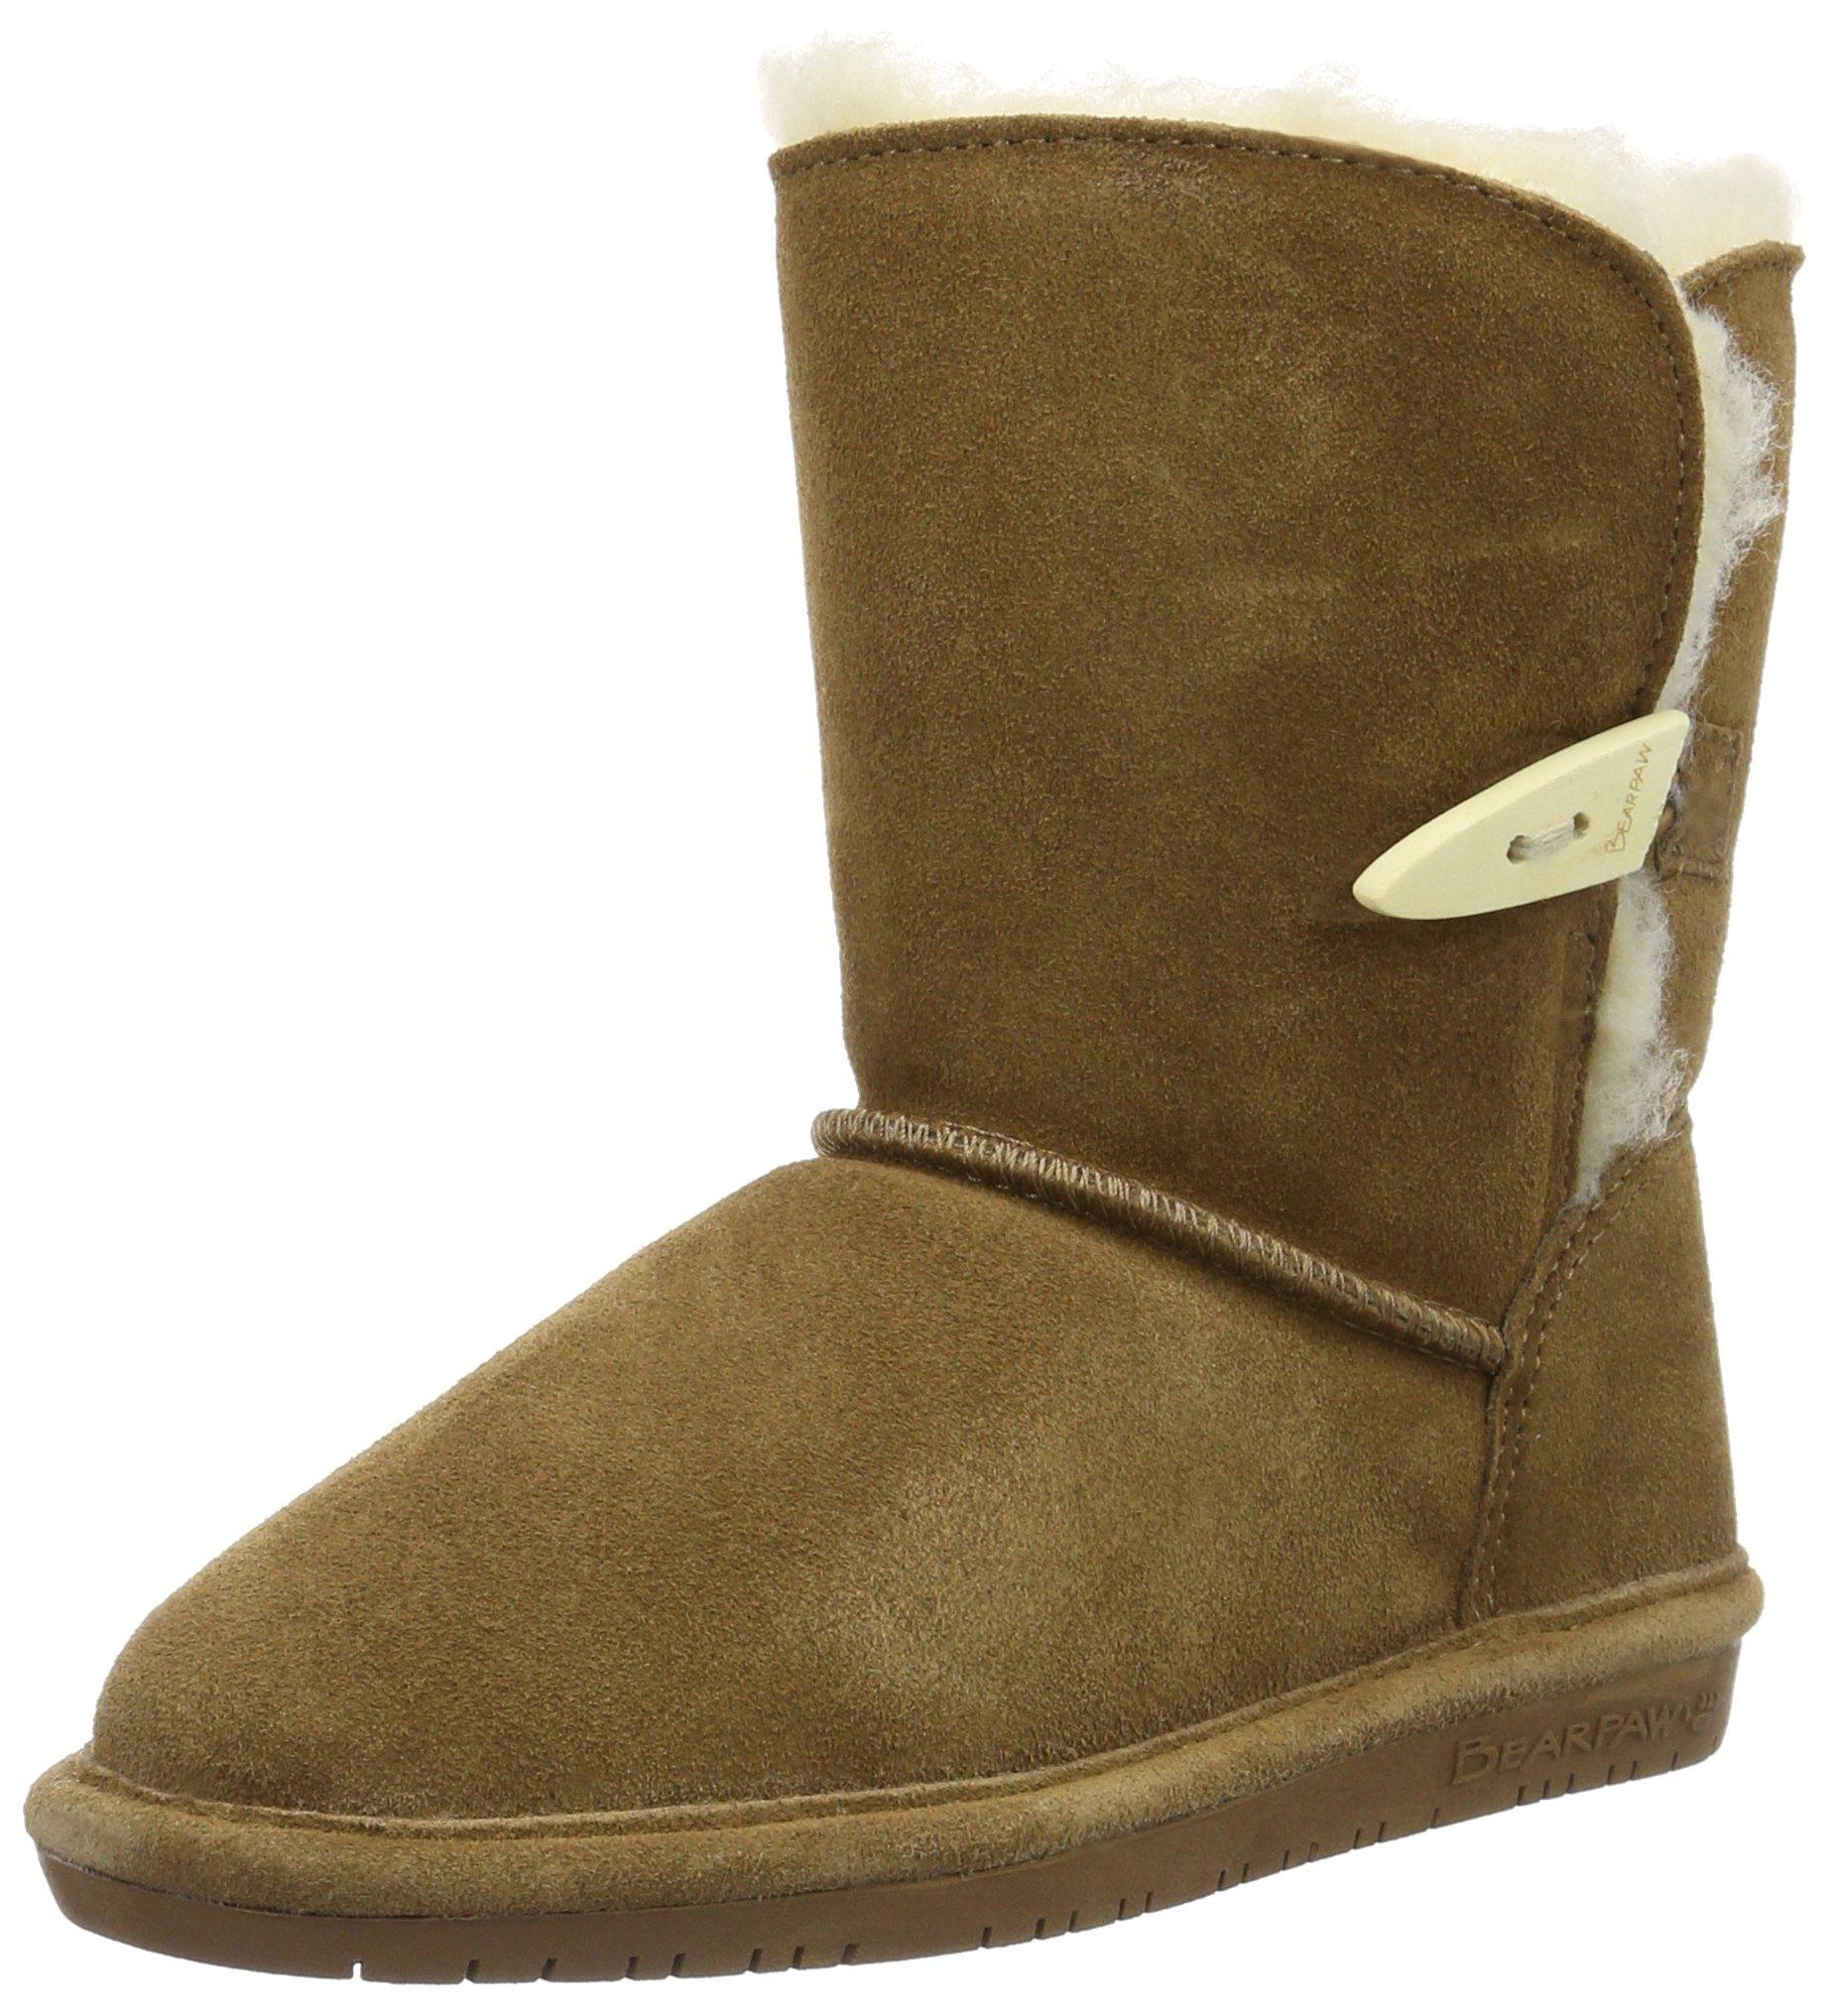 BEARPAW Kid's ABIGAIL YOUTH Boot, hickory ii, 4 M US Big Kid